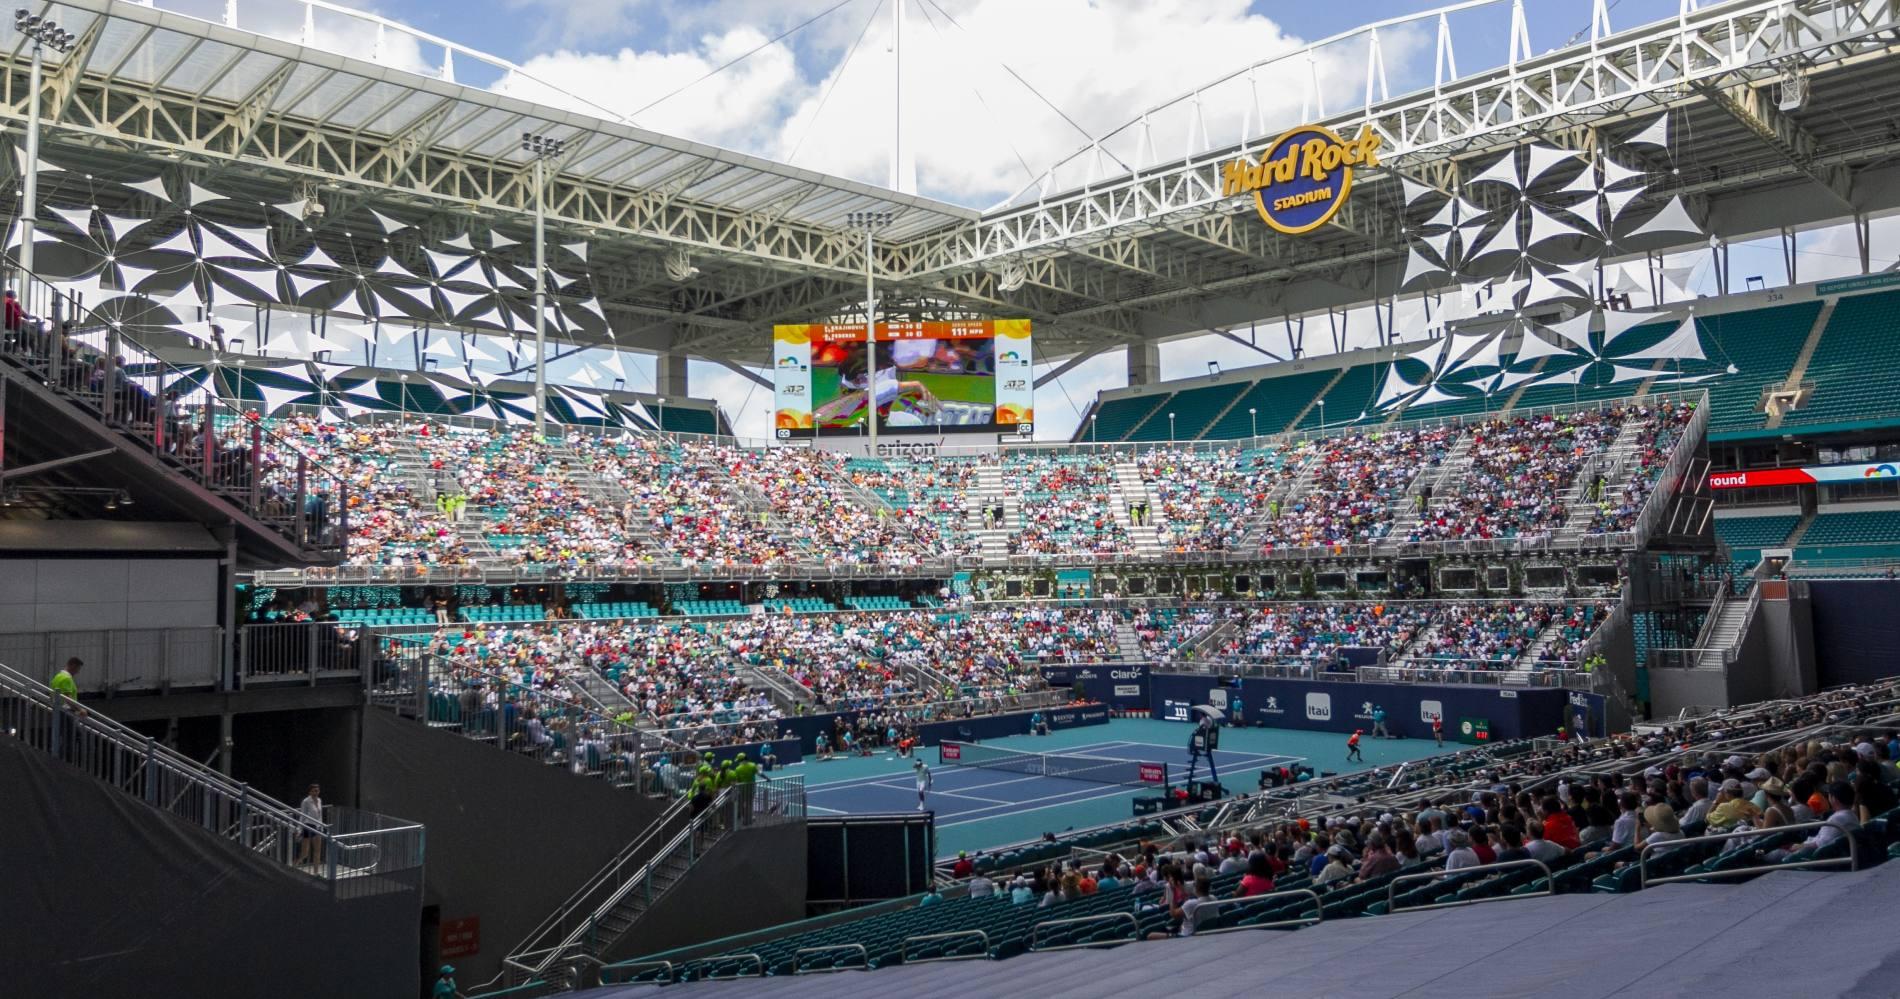 Miami Open 2019